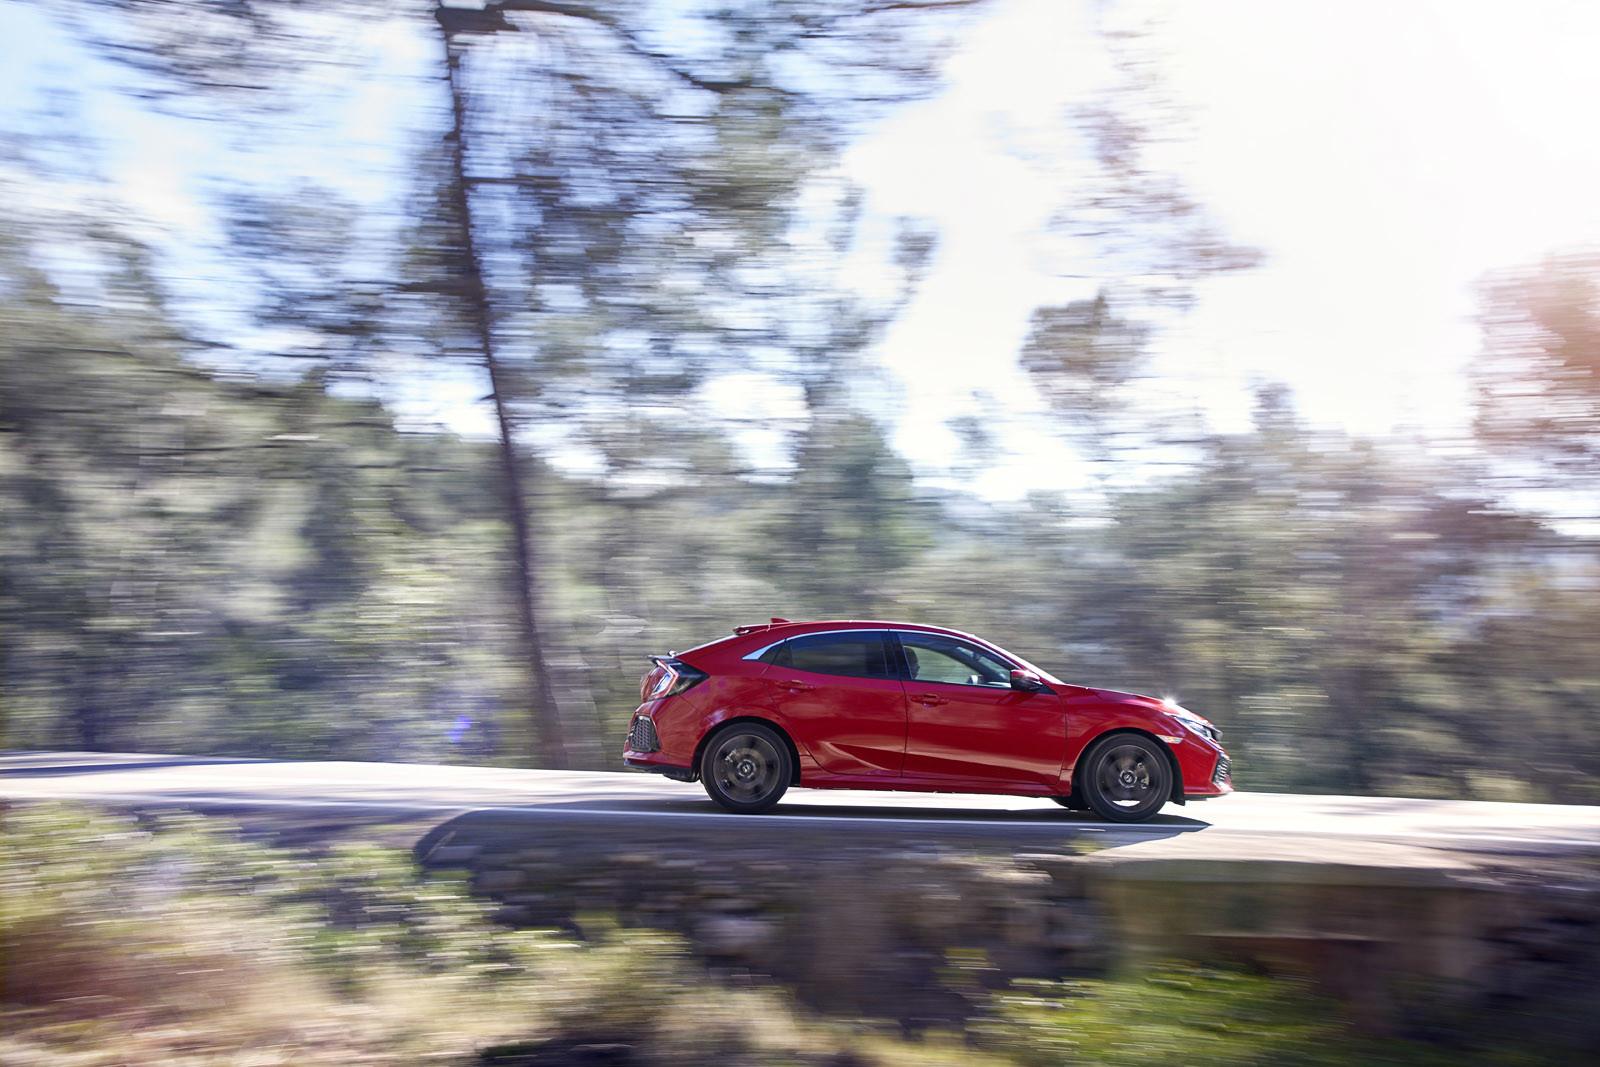 Honda Civic 2017, toma de contacto